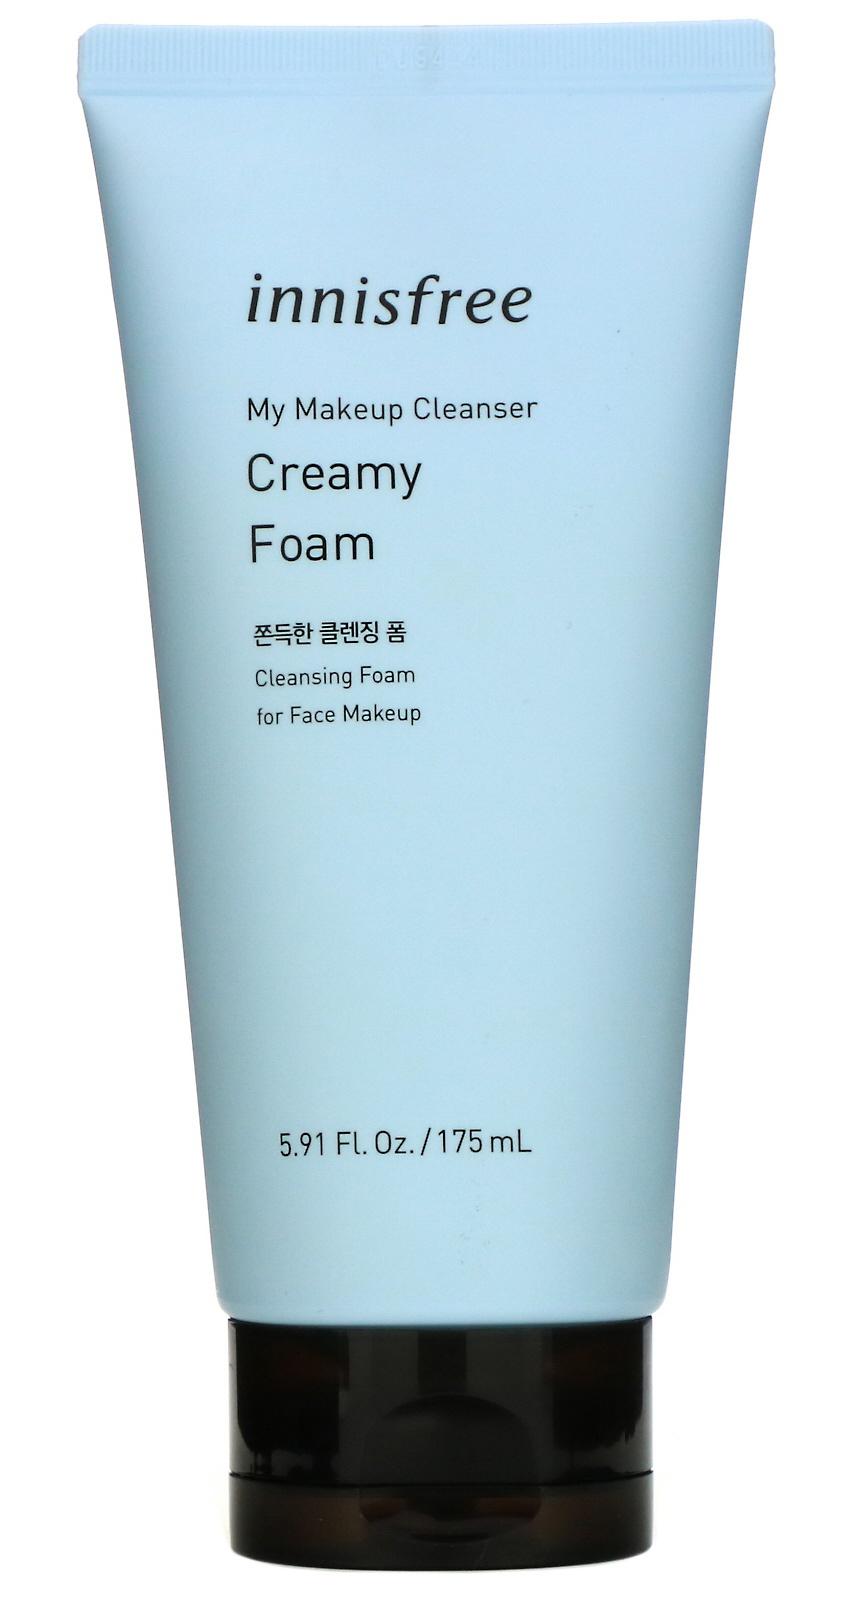 innisfree My Makeup Cleanser, Creamy Foam